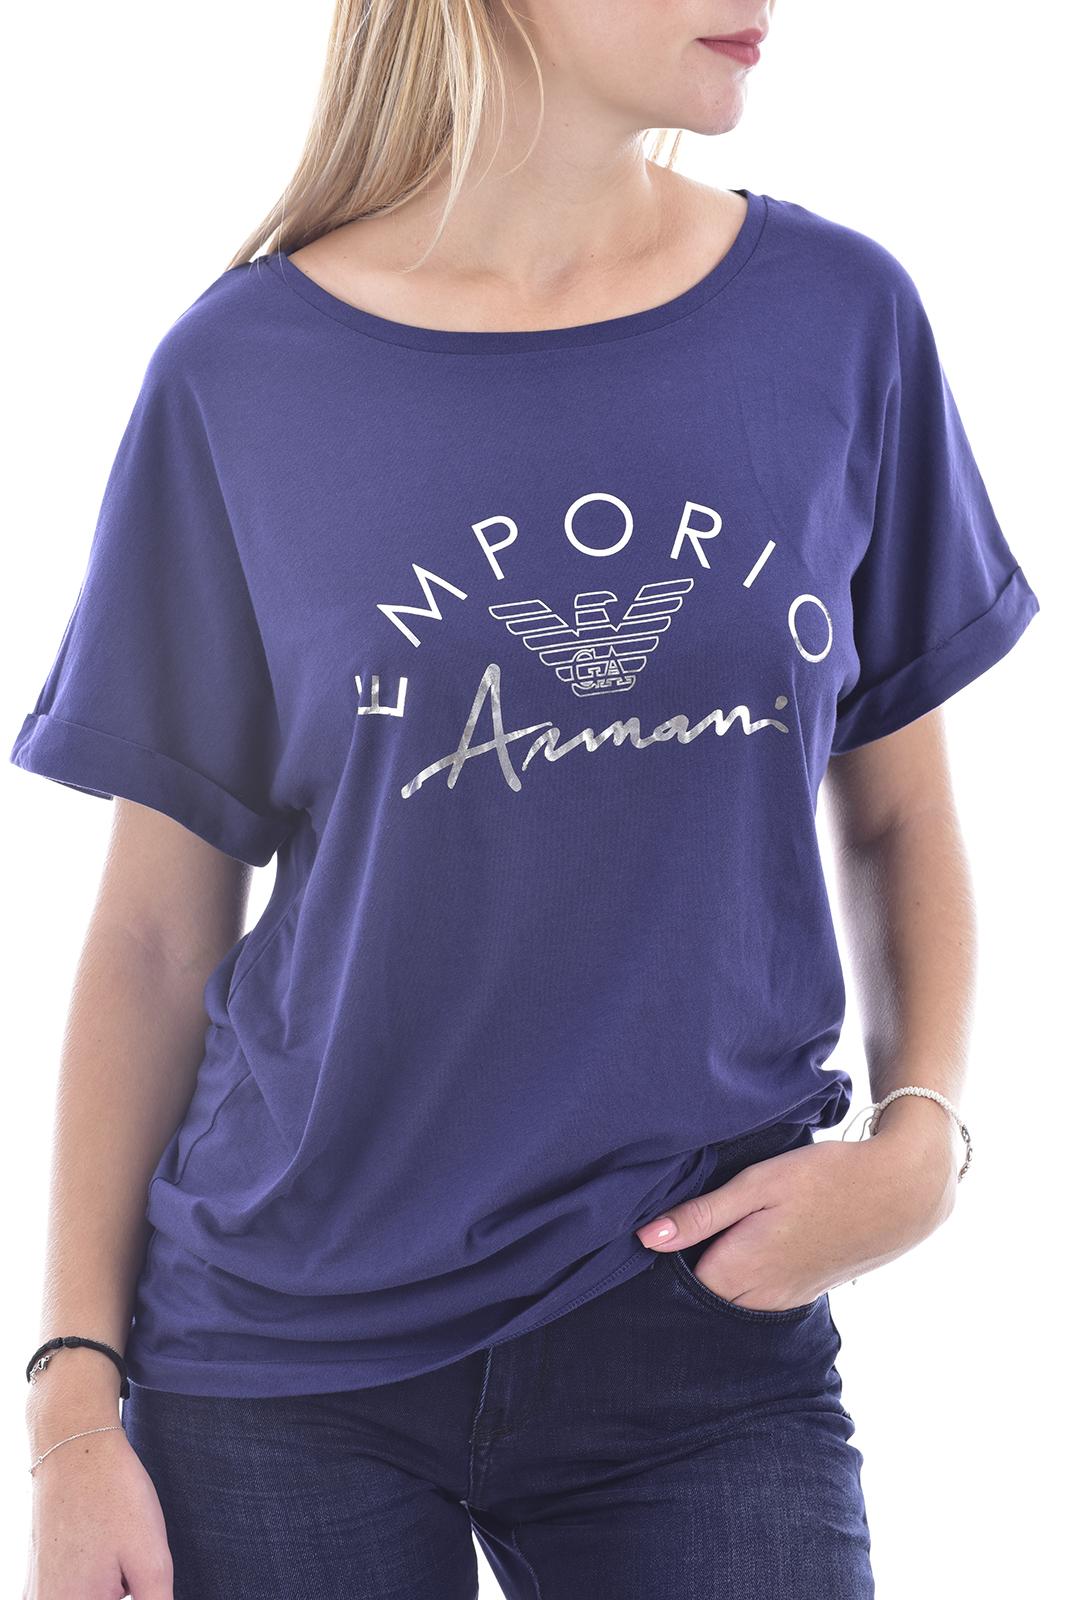 Tee shirt  Emporio armani 164340 0P291 15434 BLU INDACO